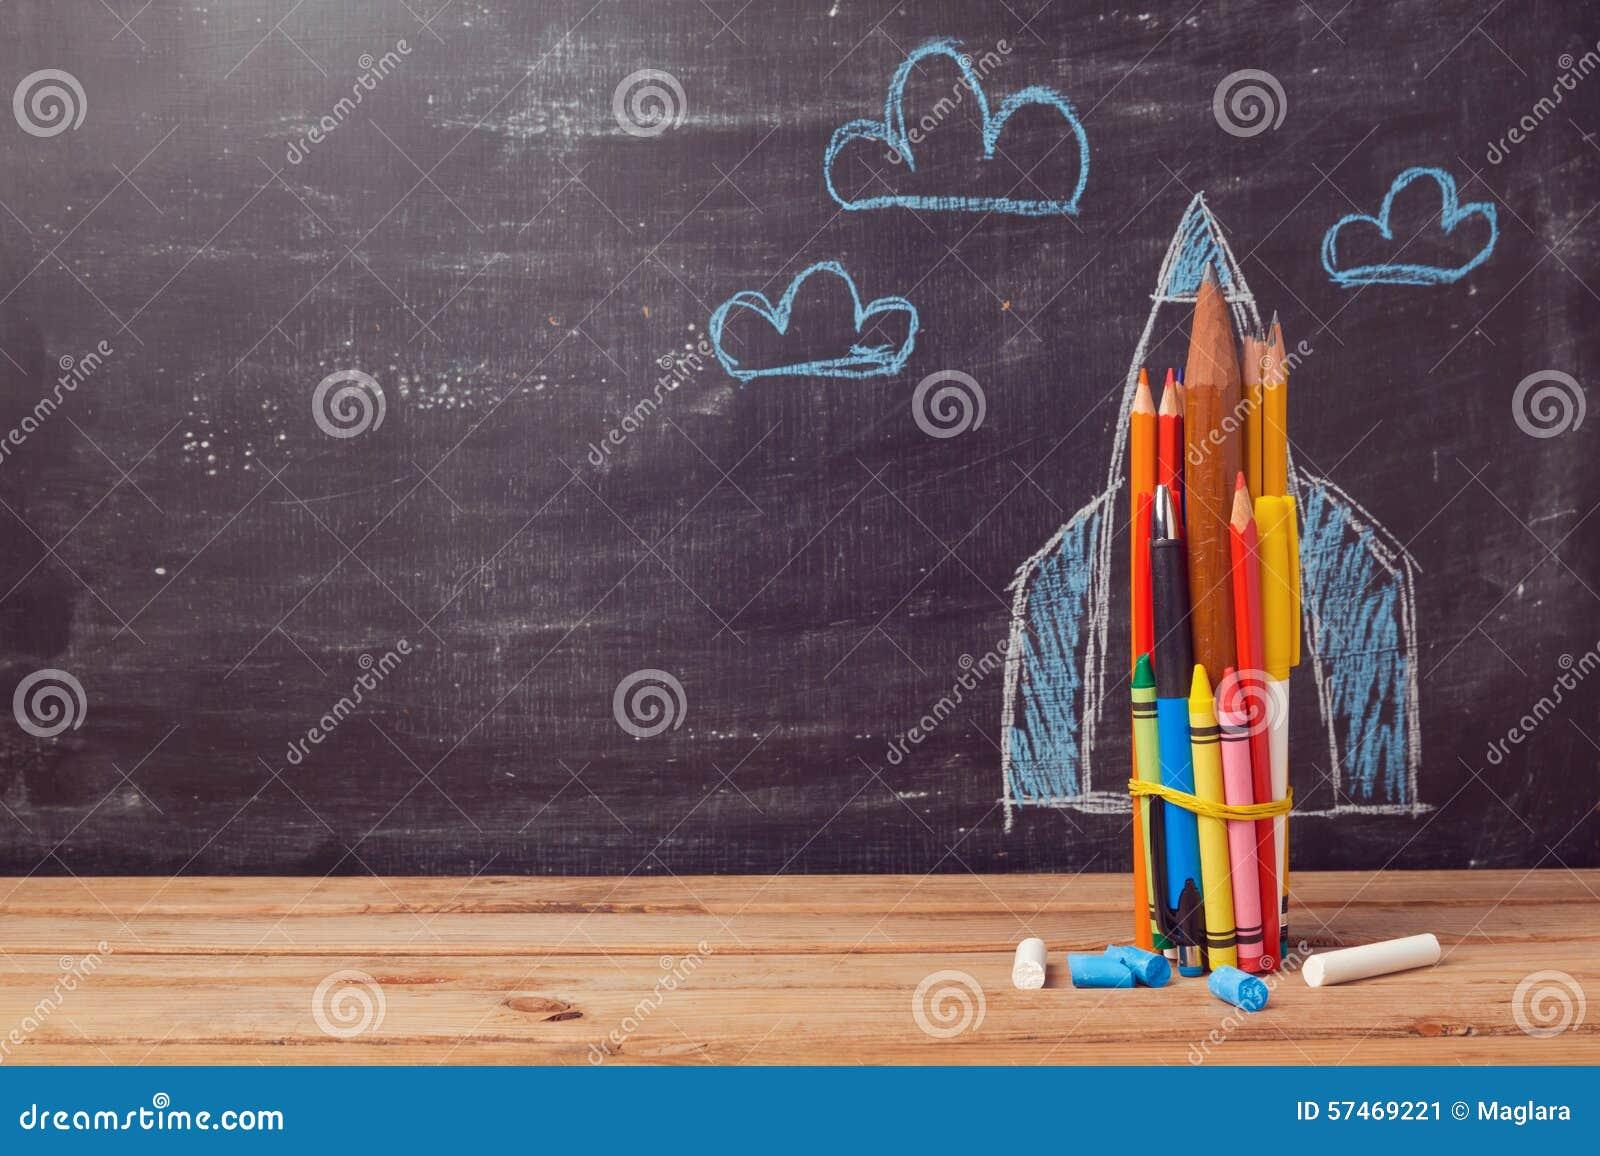 De volta ao fundo da escola com o foguete feito dos lápis coloridos